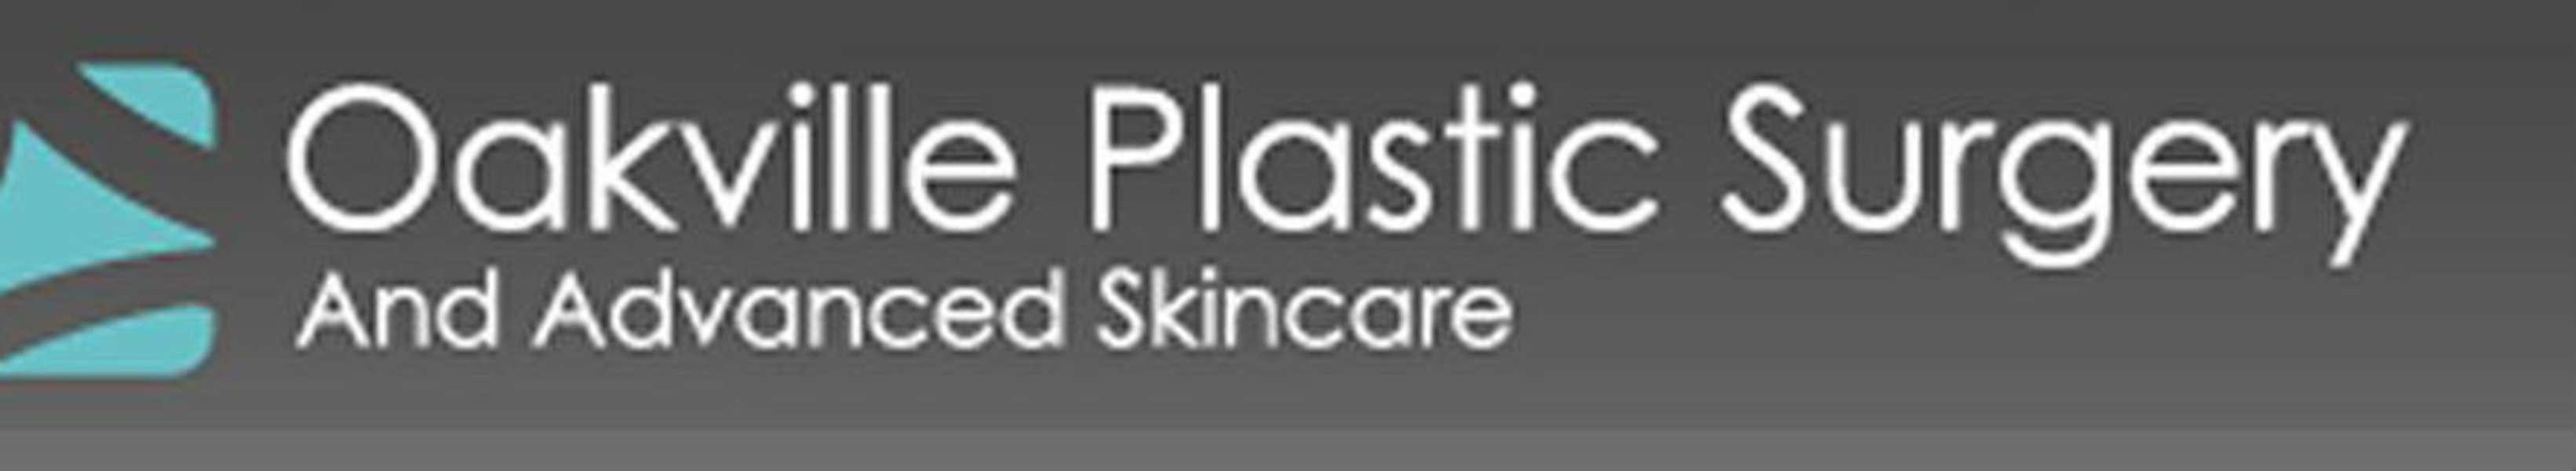 Oakville Plastic Surgery